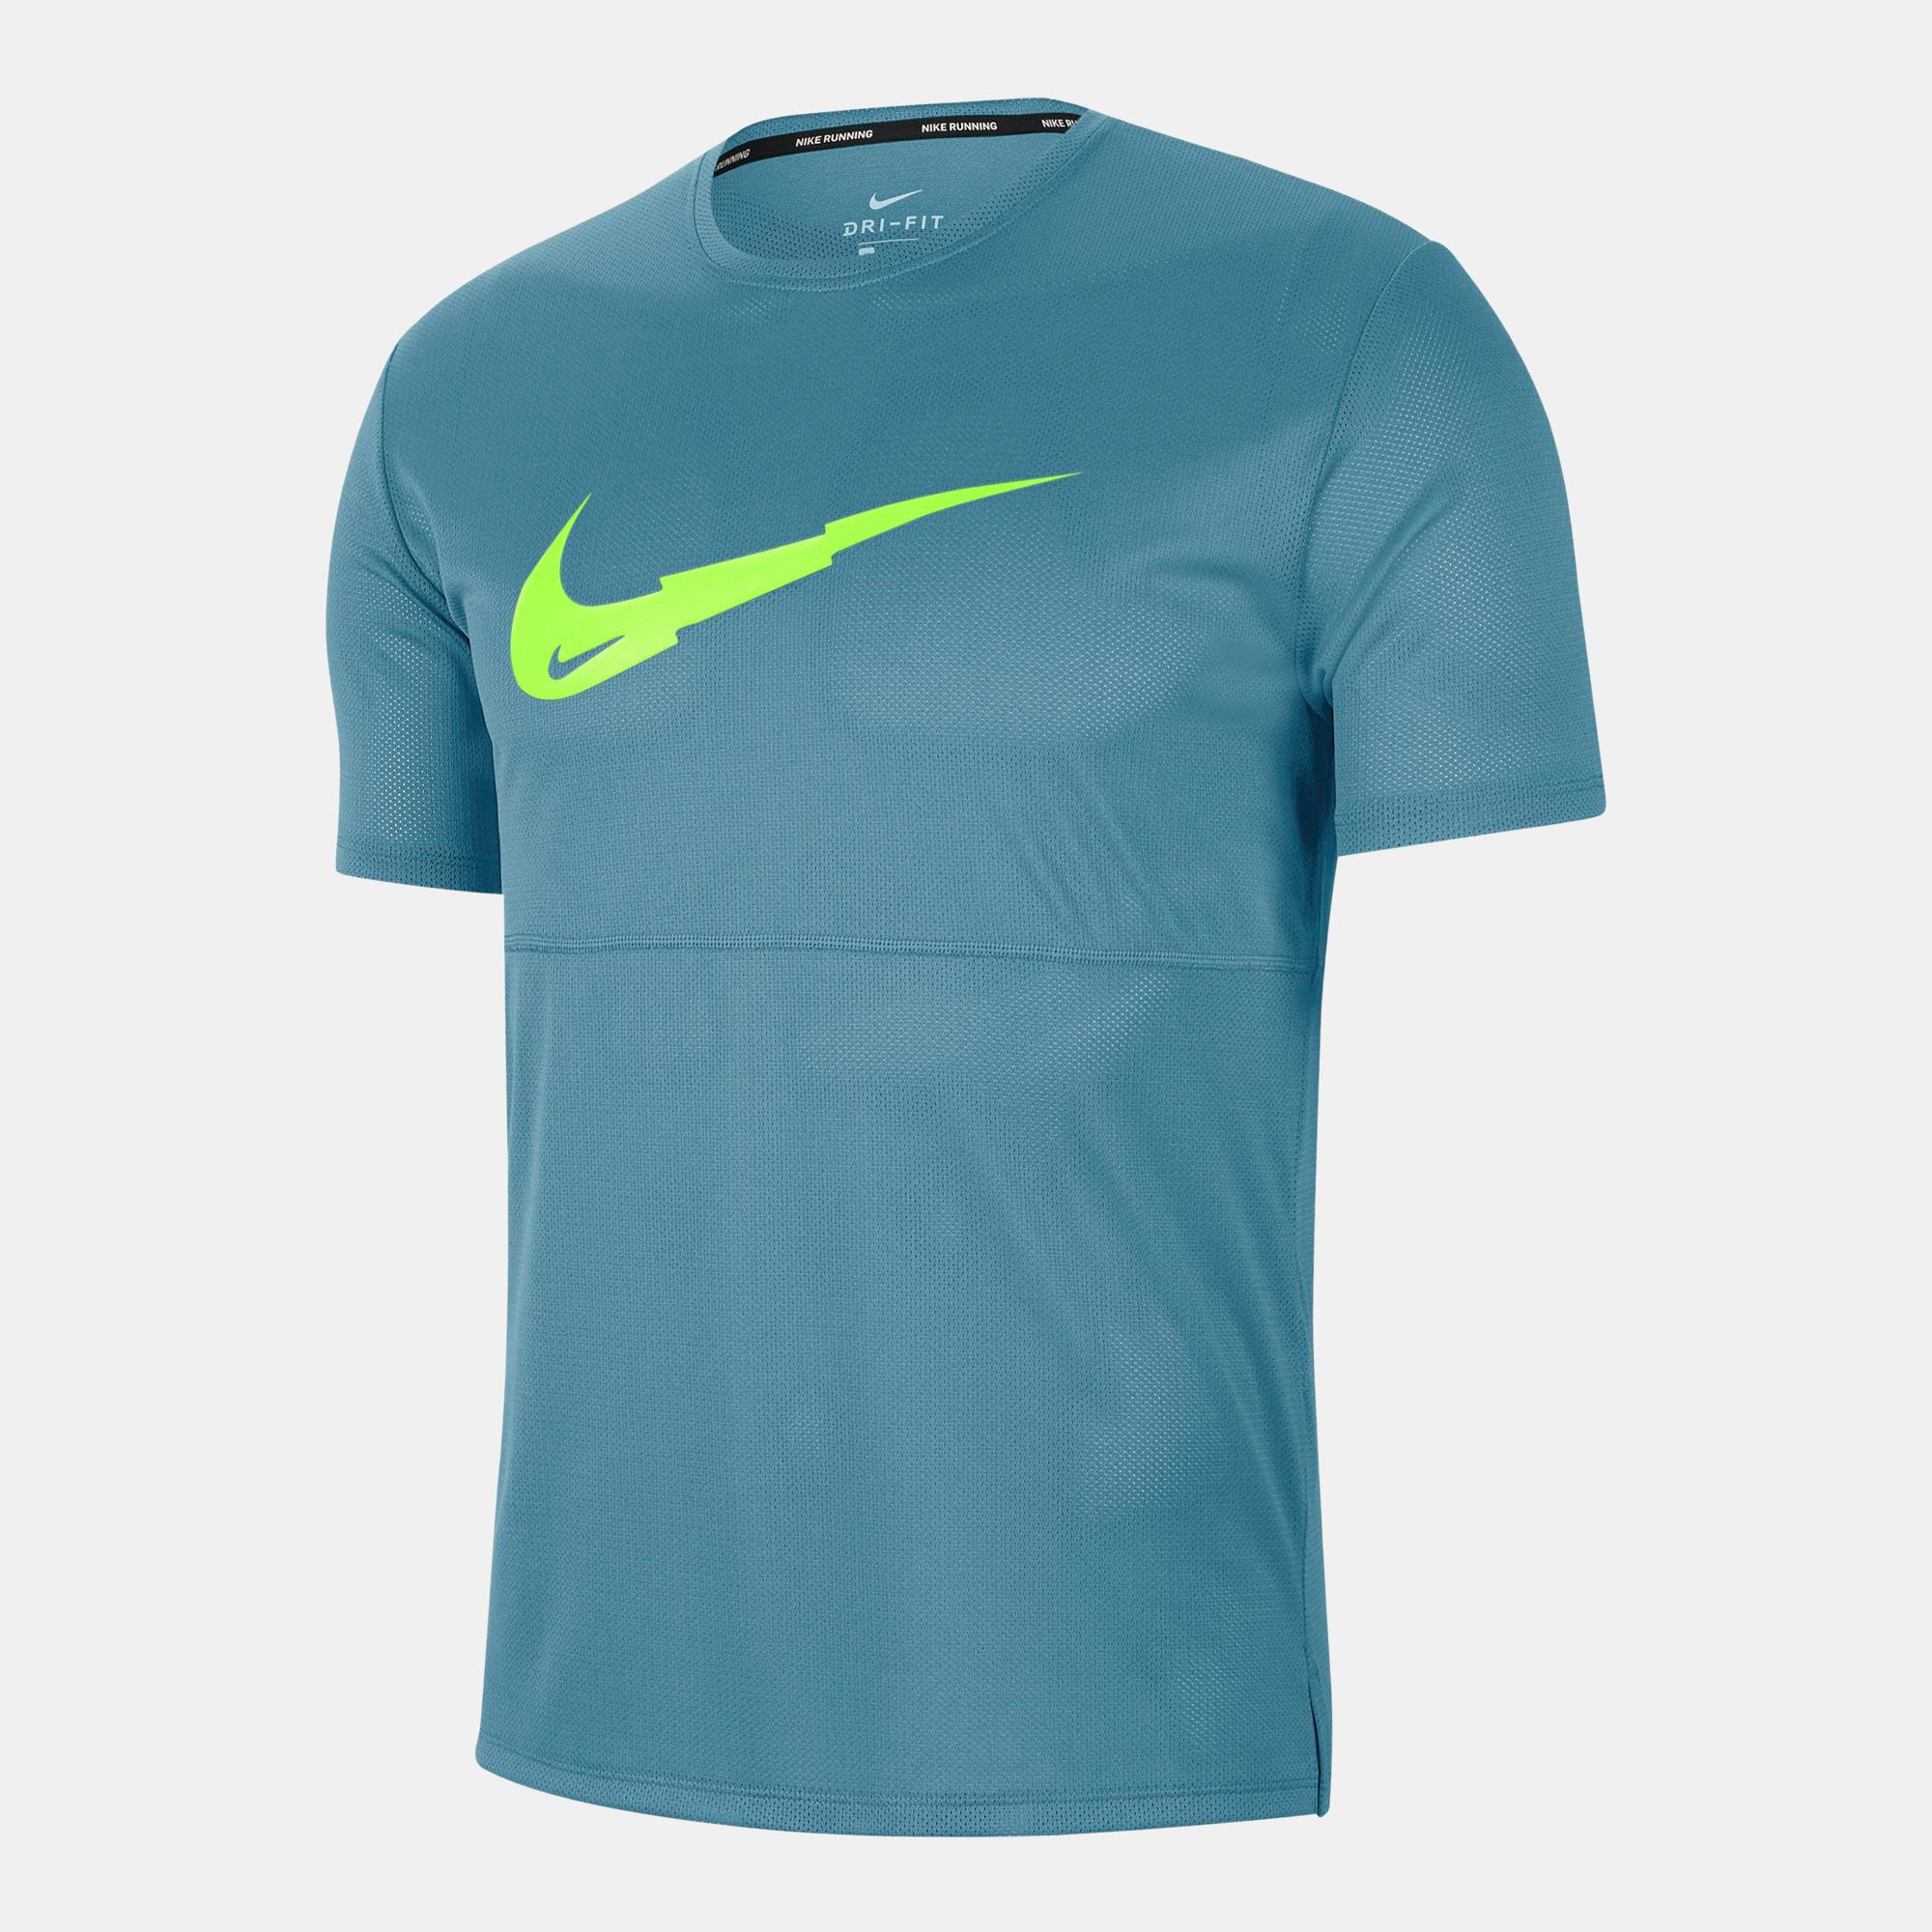 Nike Men's Breathe Run WR T-Shirt